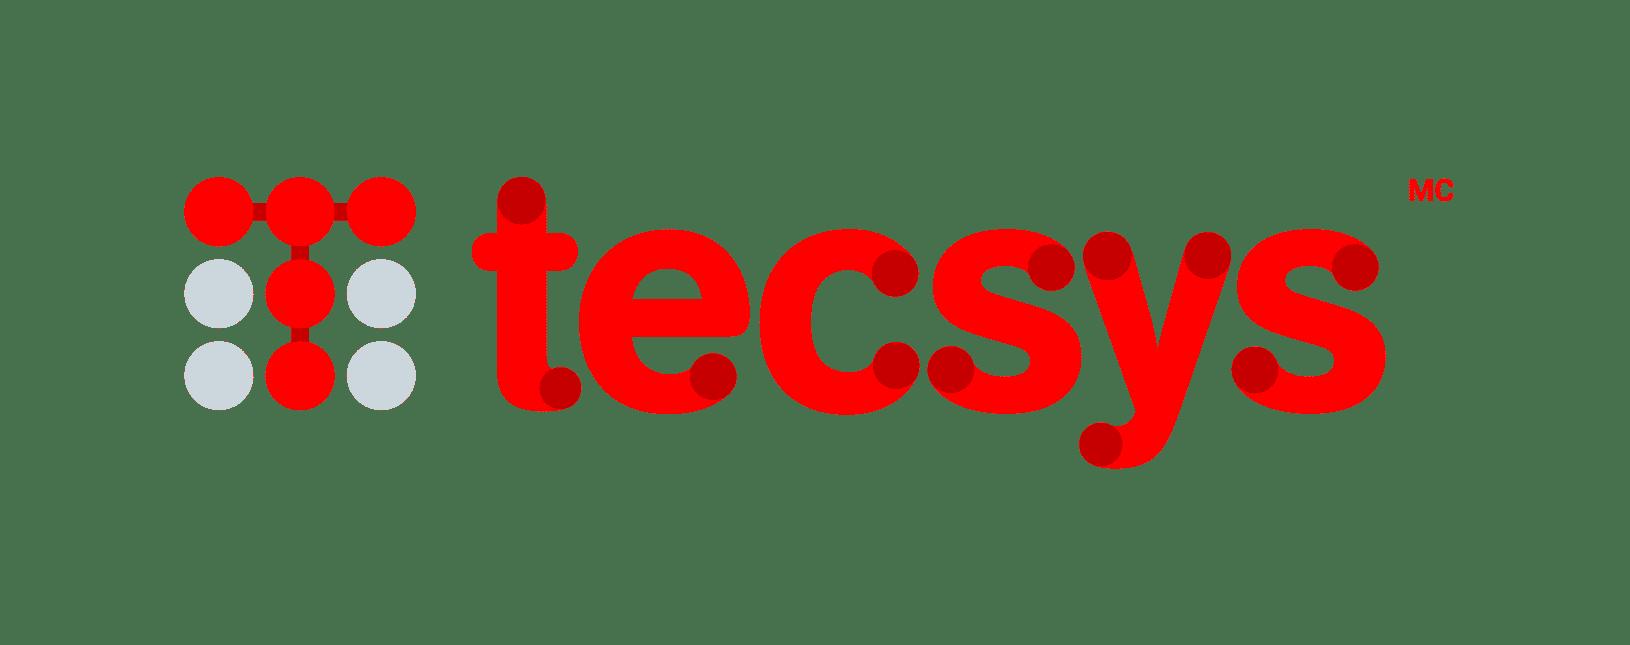 tecsys-red-logo-rgb-mc